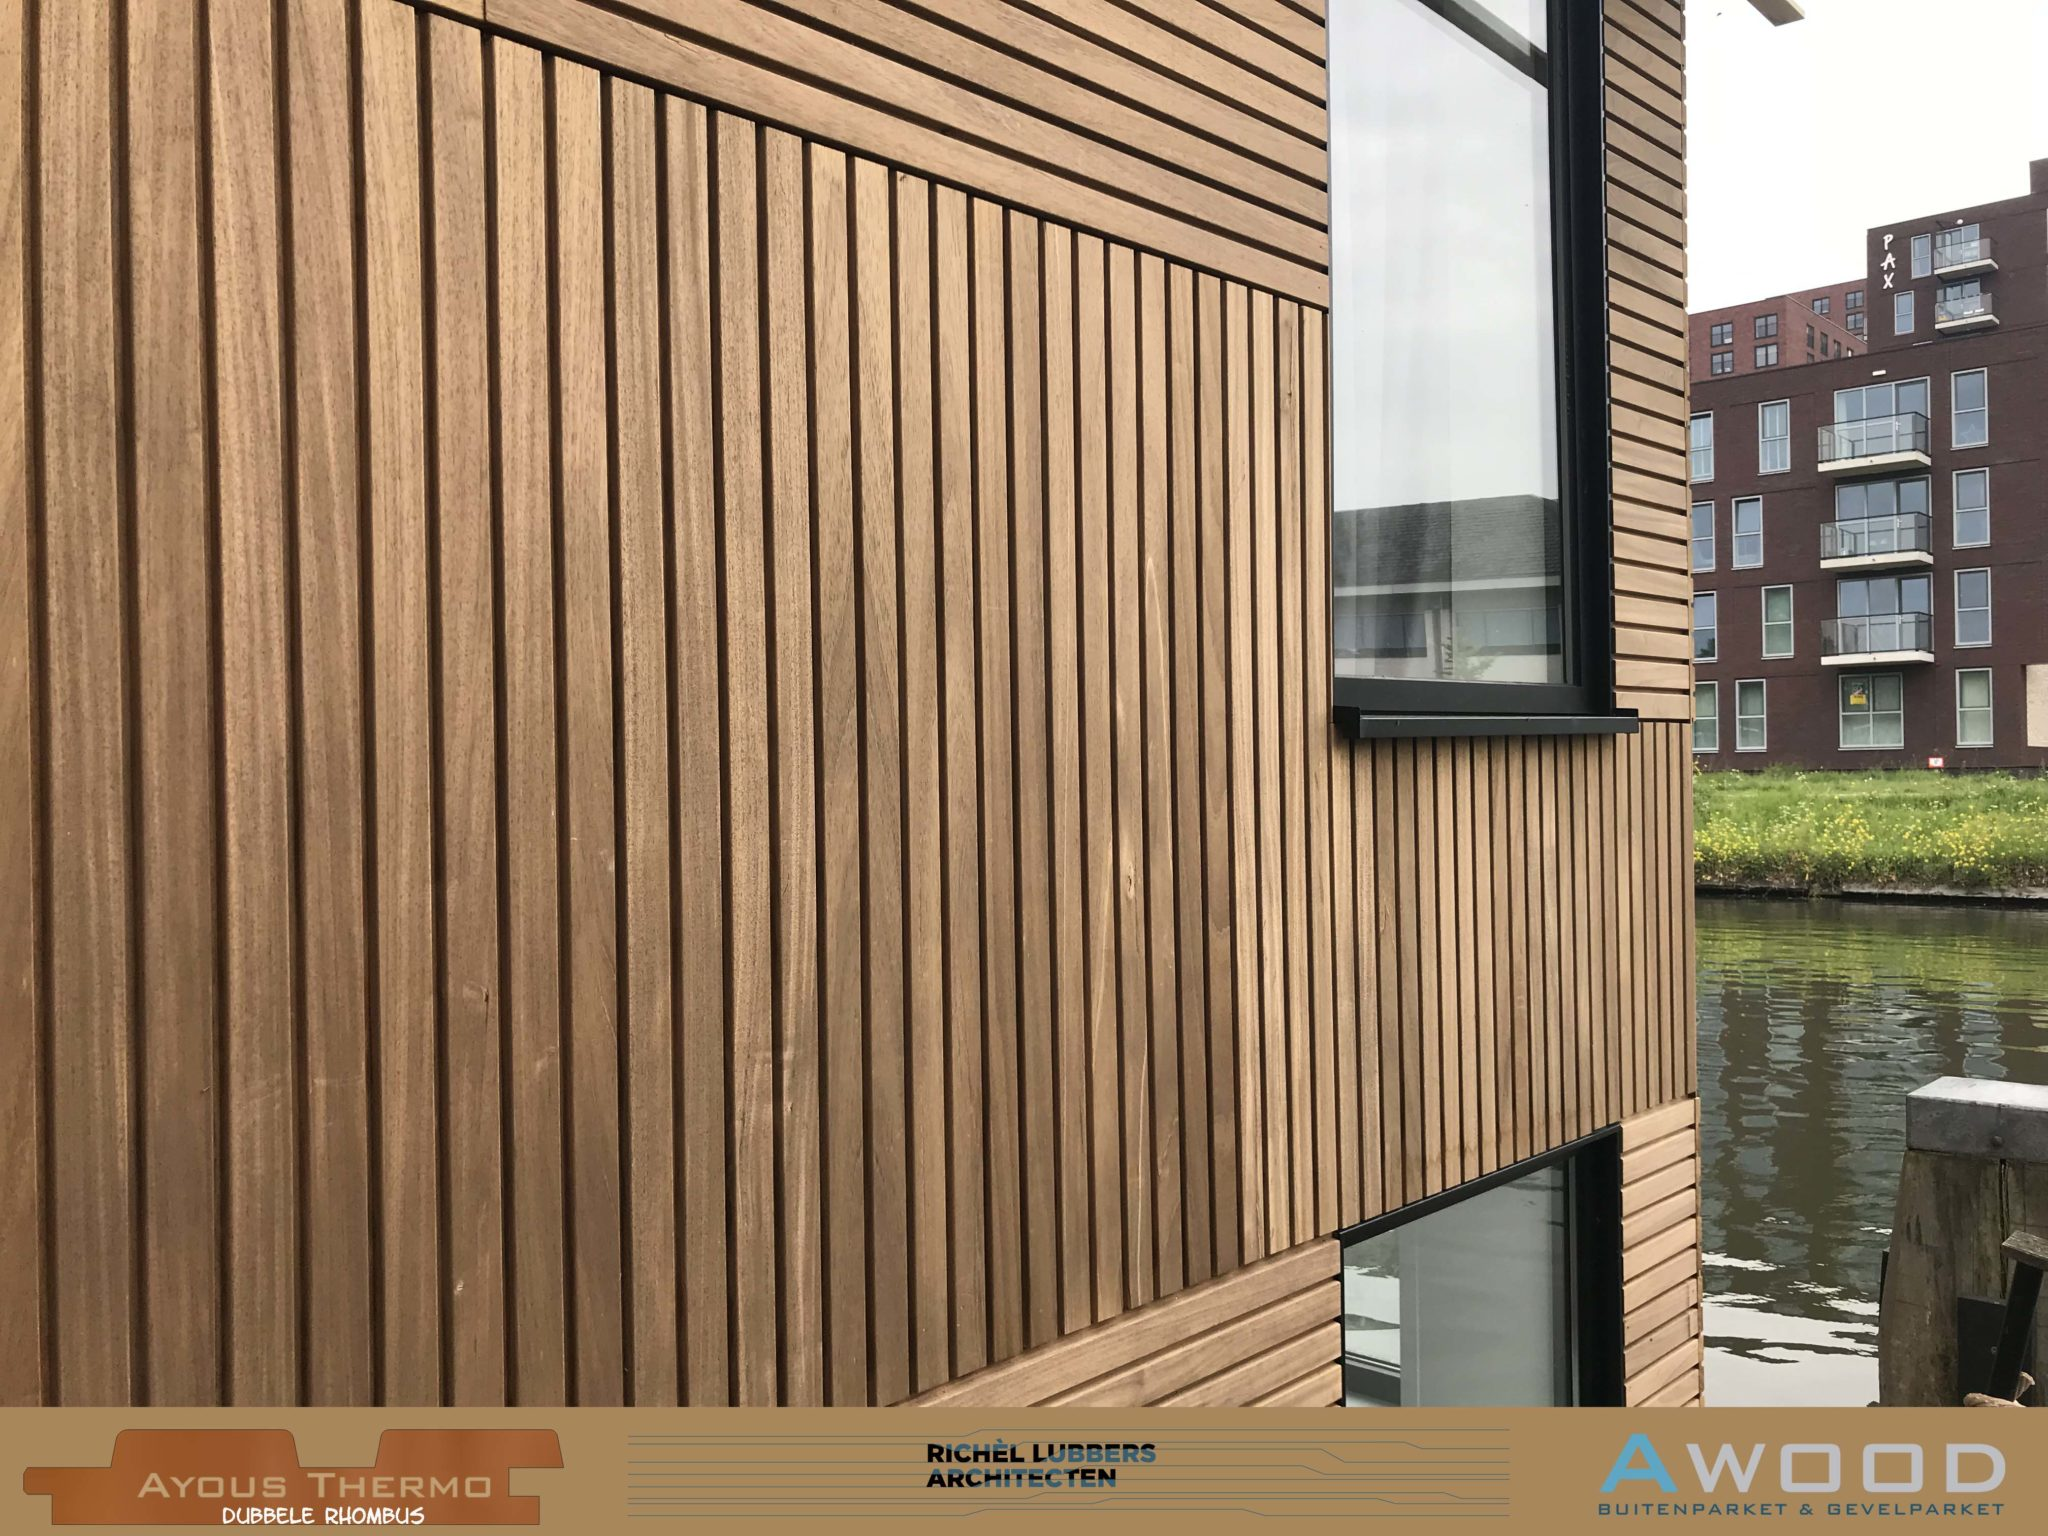 Ayous Dubbele Rhombus Woonboot Utrecht Richel Lubers Architect 9